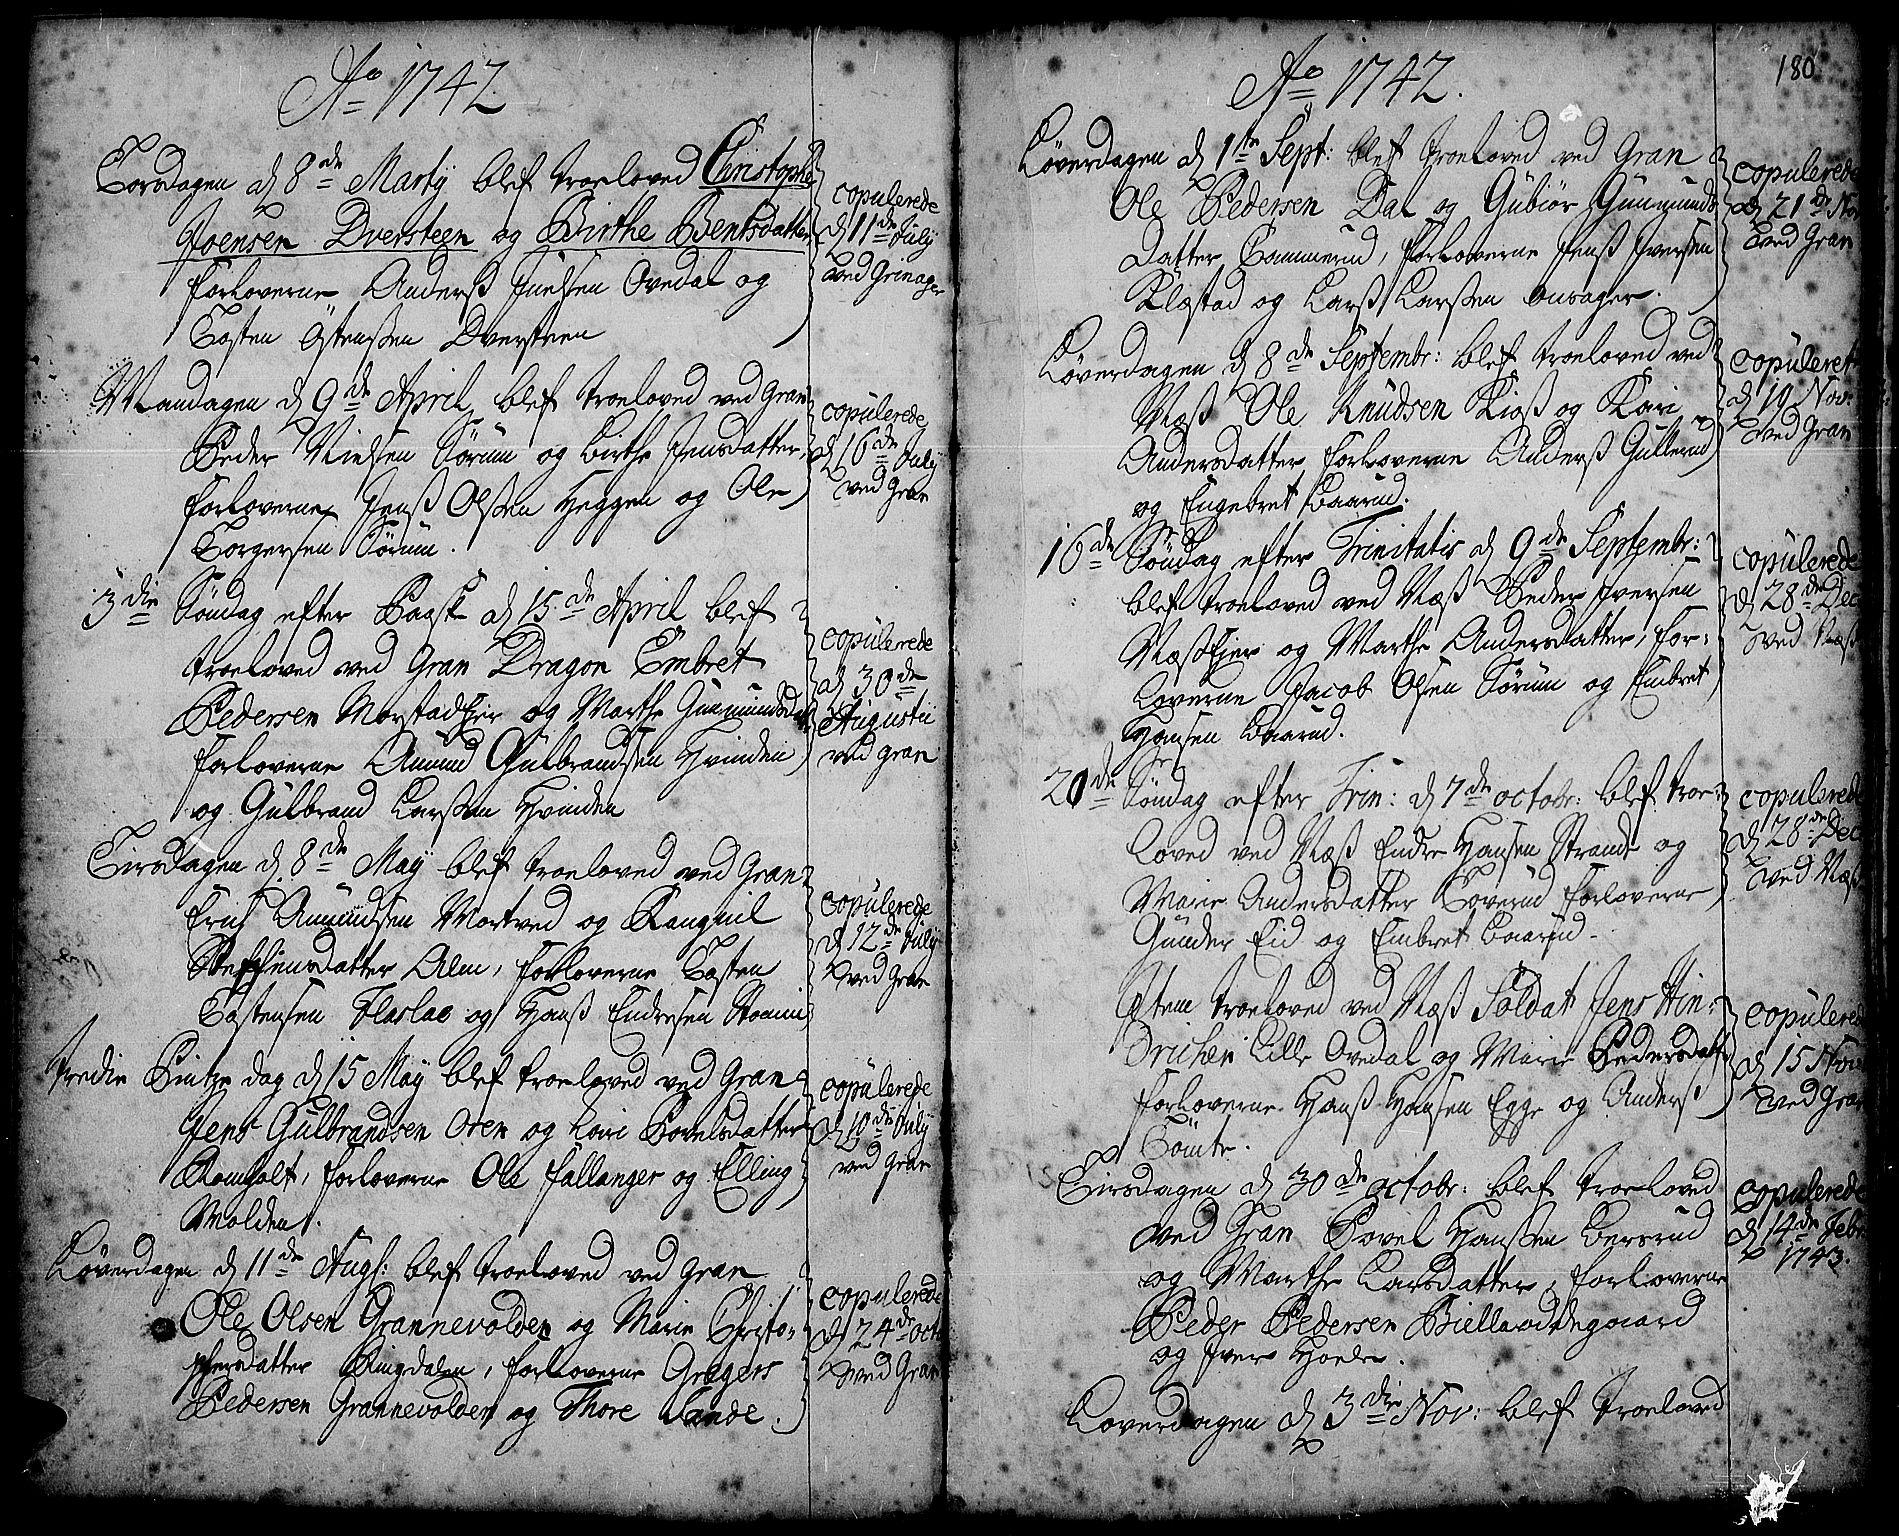 SAH, Gran prestekontor, Ministerialbok nr. 2, 1732-1744, s. 180